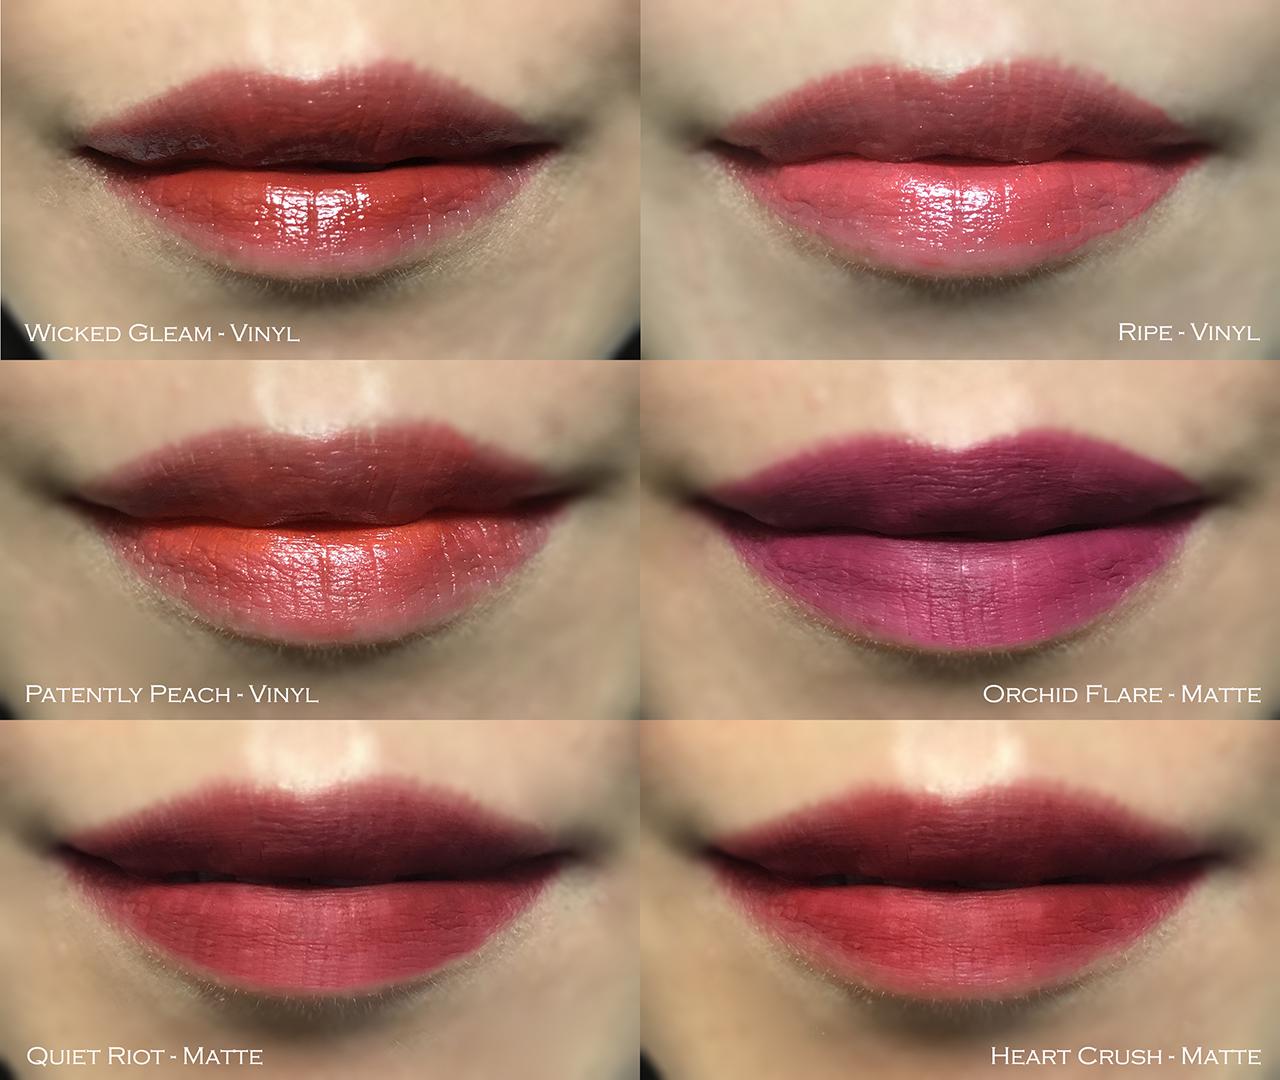 Estee Lauder Pure Color Envy Liquid Lip Color swatches